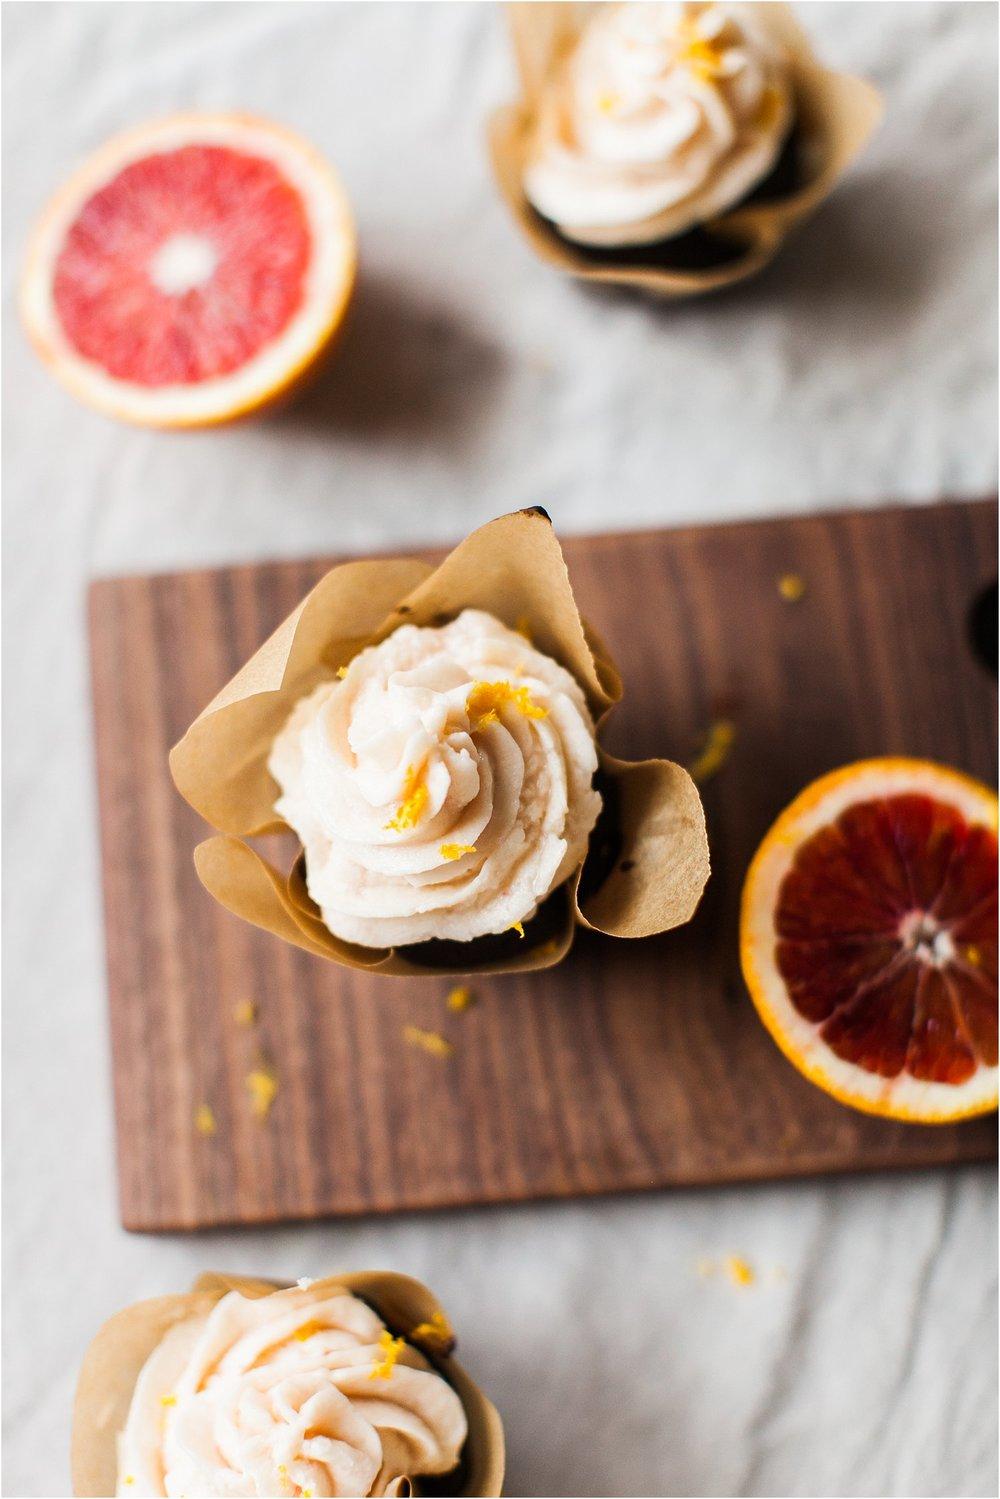 Gluten Free Blood Orange Chocolate Cupcakes with Blood Orange Buttercream | Feast & Dwell